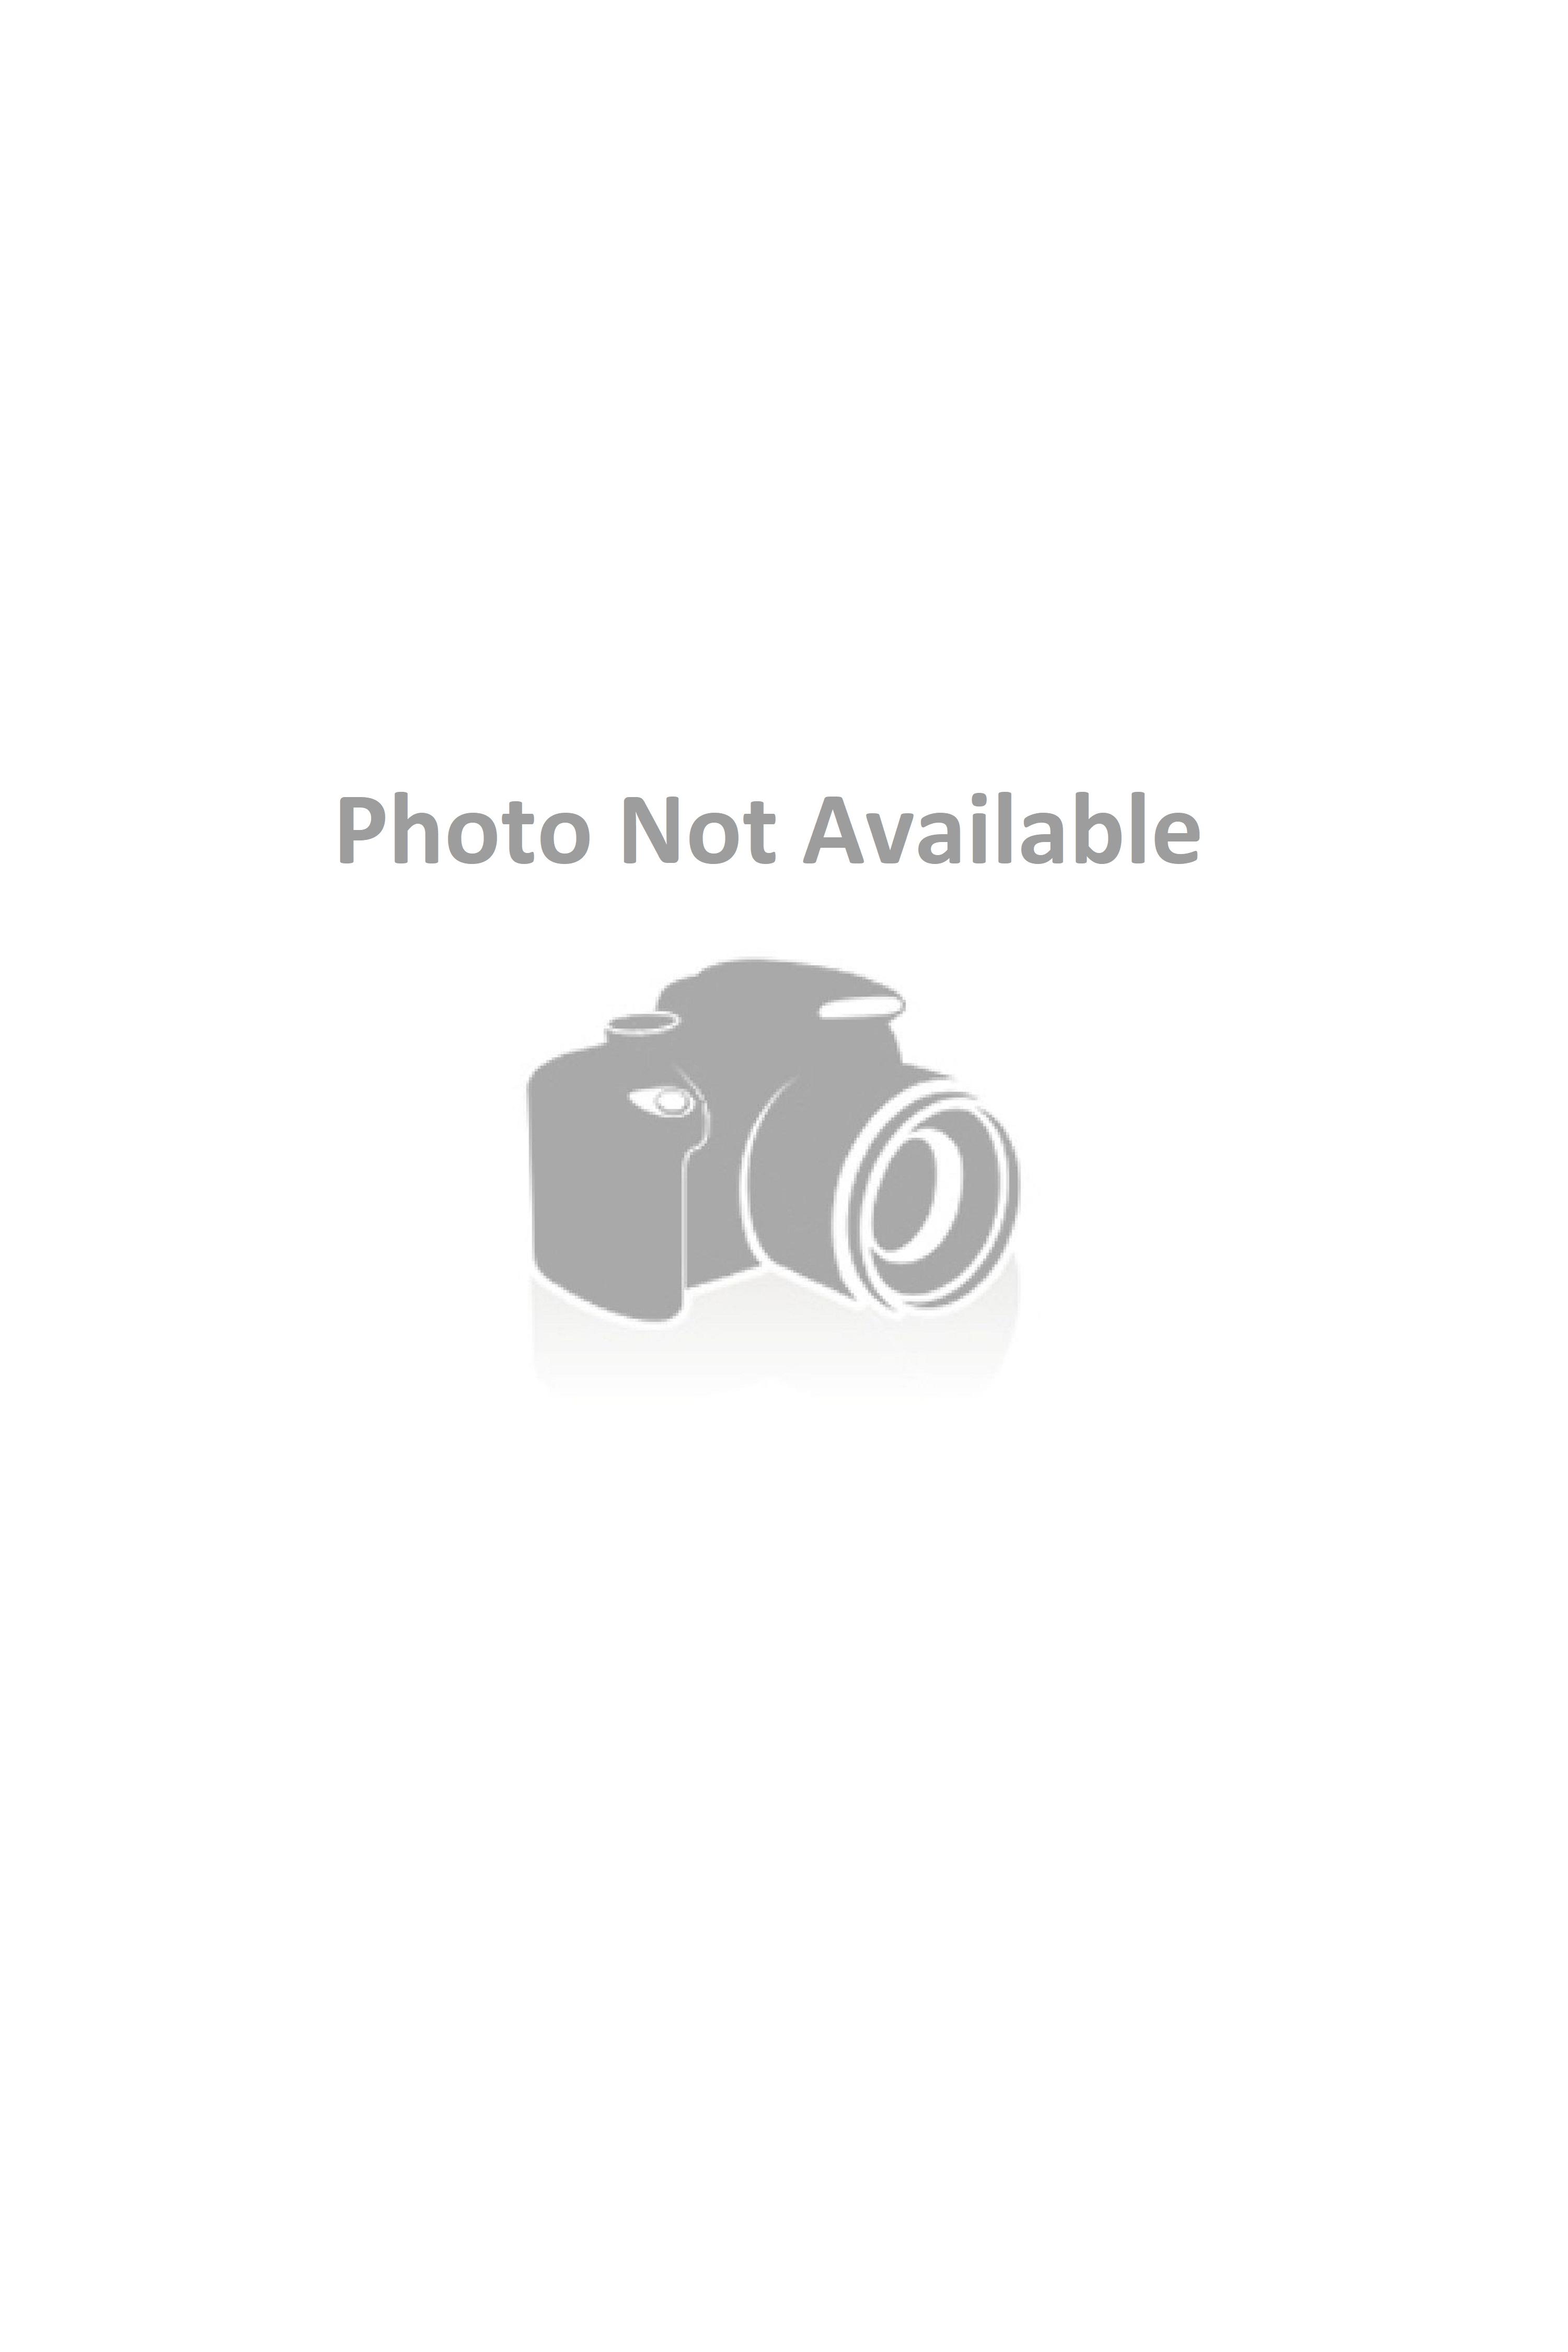 T-SHIRT //  AURORA PINK //  38 55213 BLUSE KAFFE M